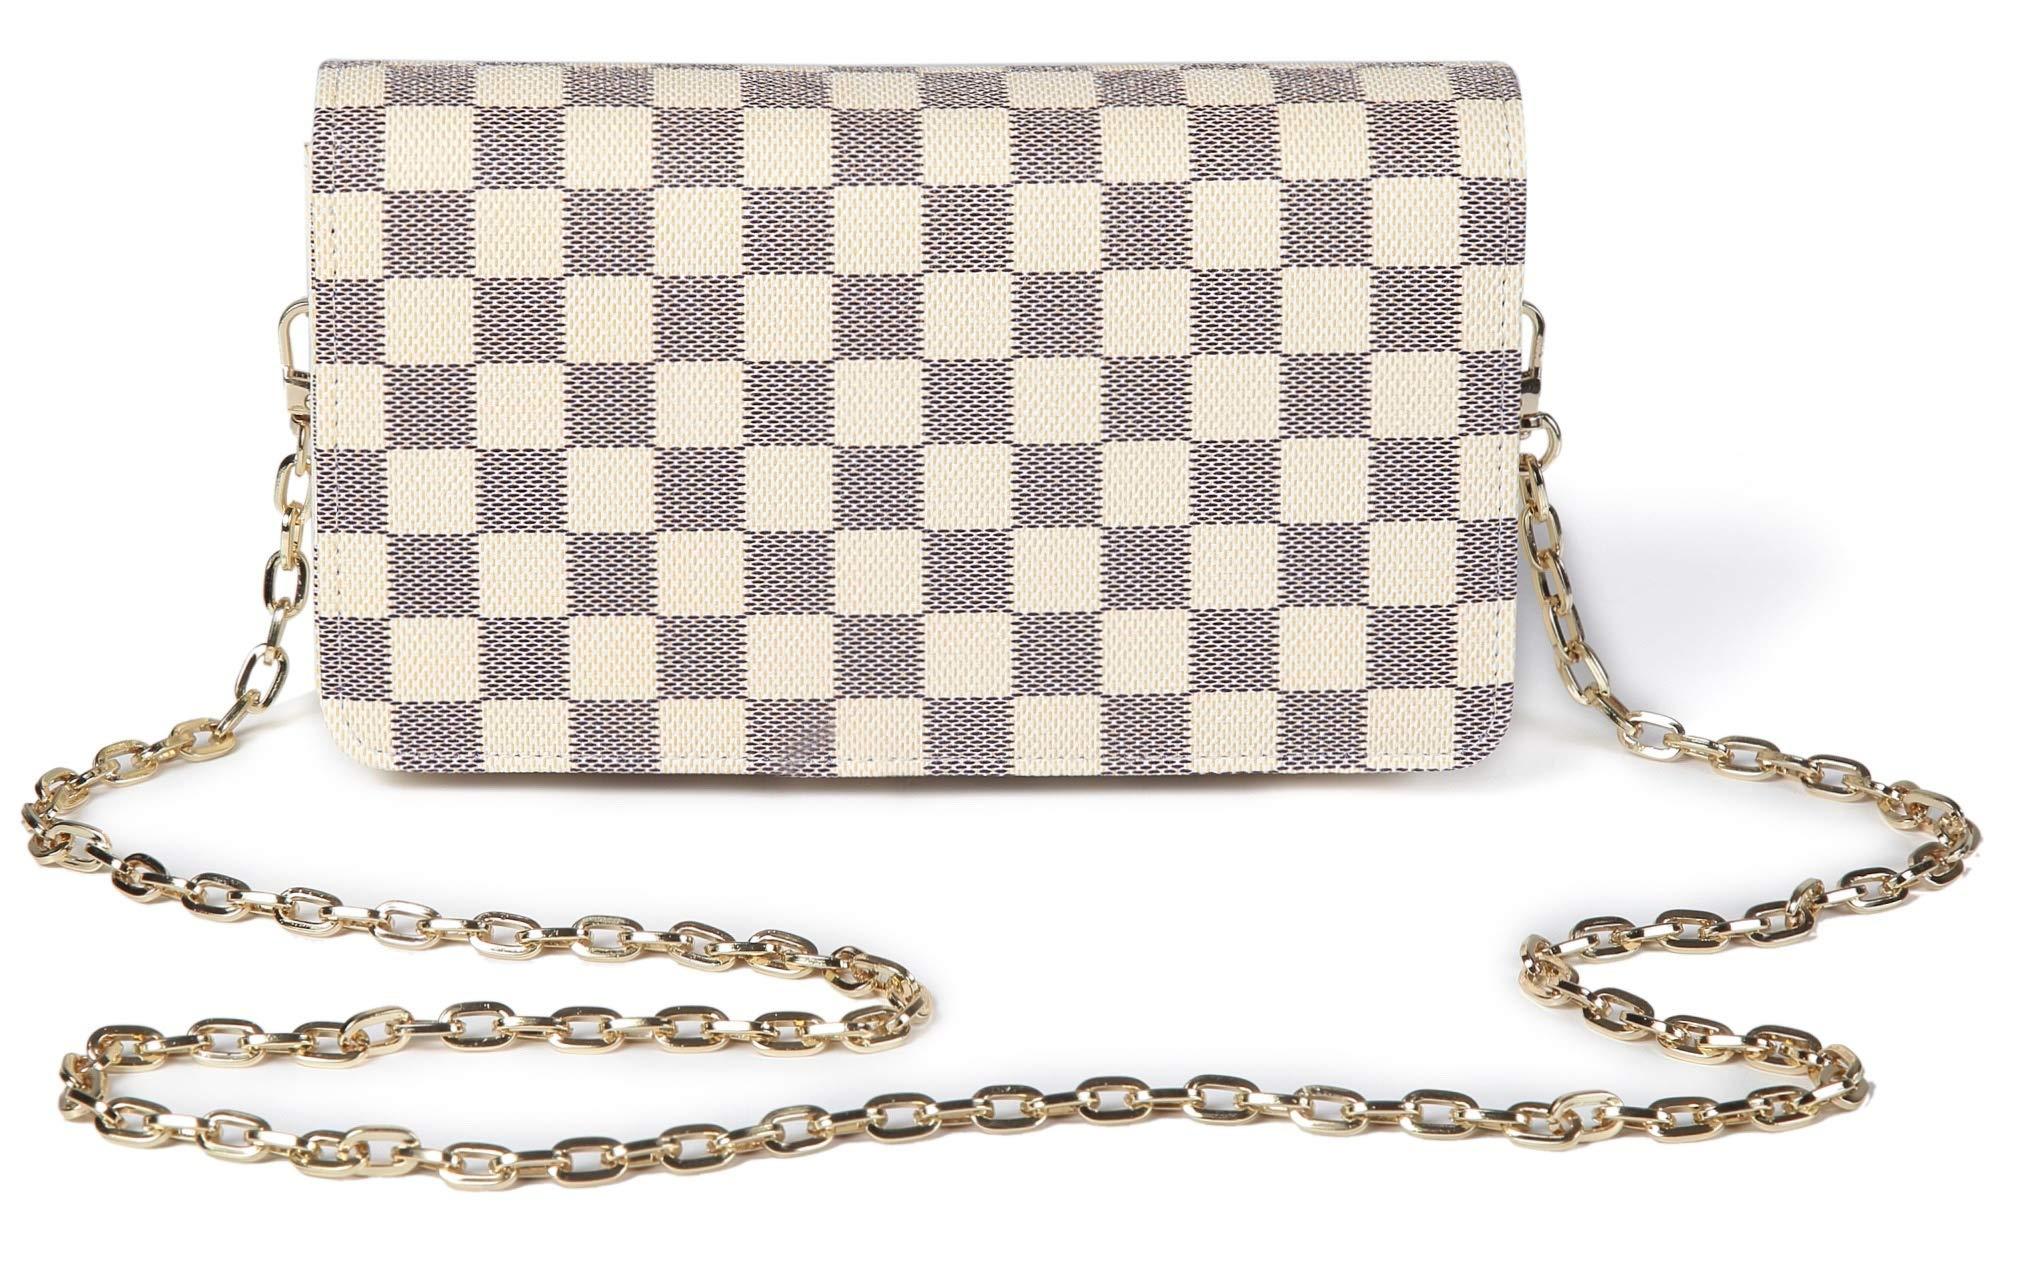 Daisy Rose Checkered Cross body bag - RFID Blocking with Credit Card slots clutch -PU Vegan Leather (CREAM)